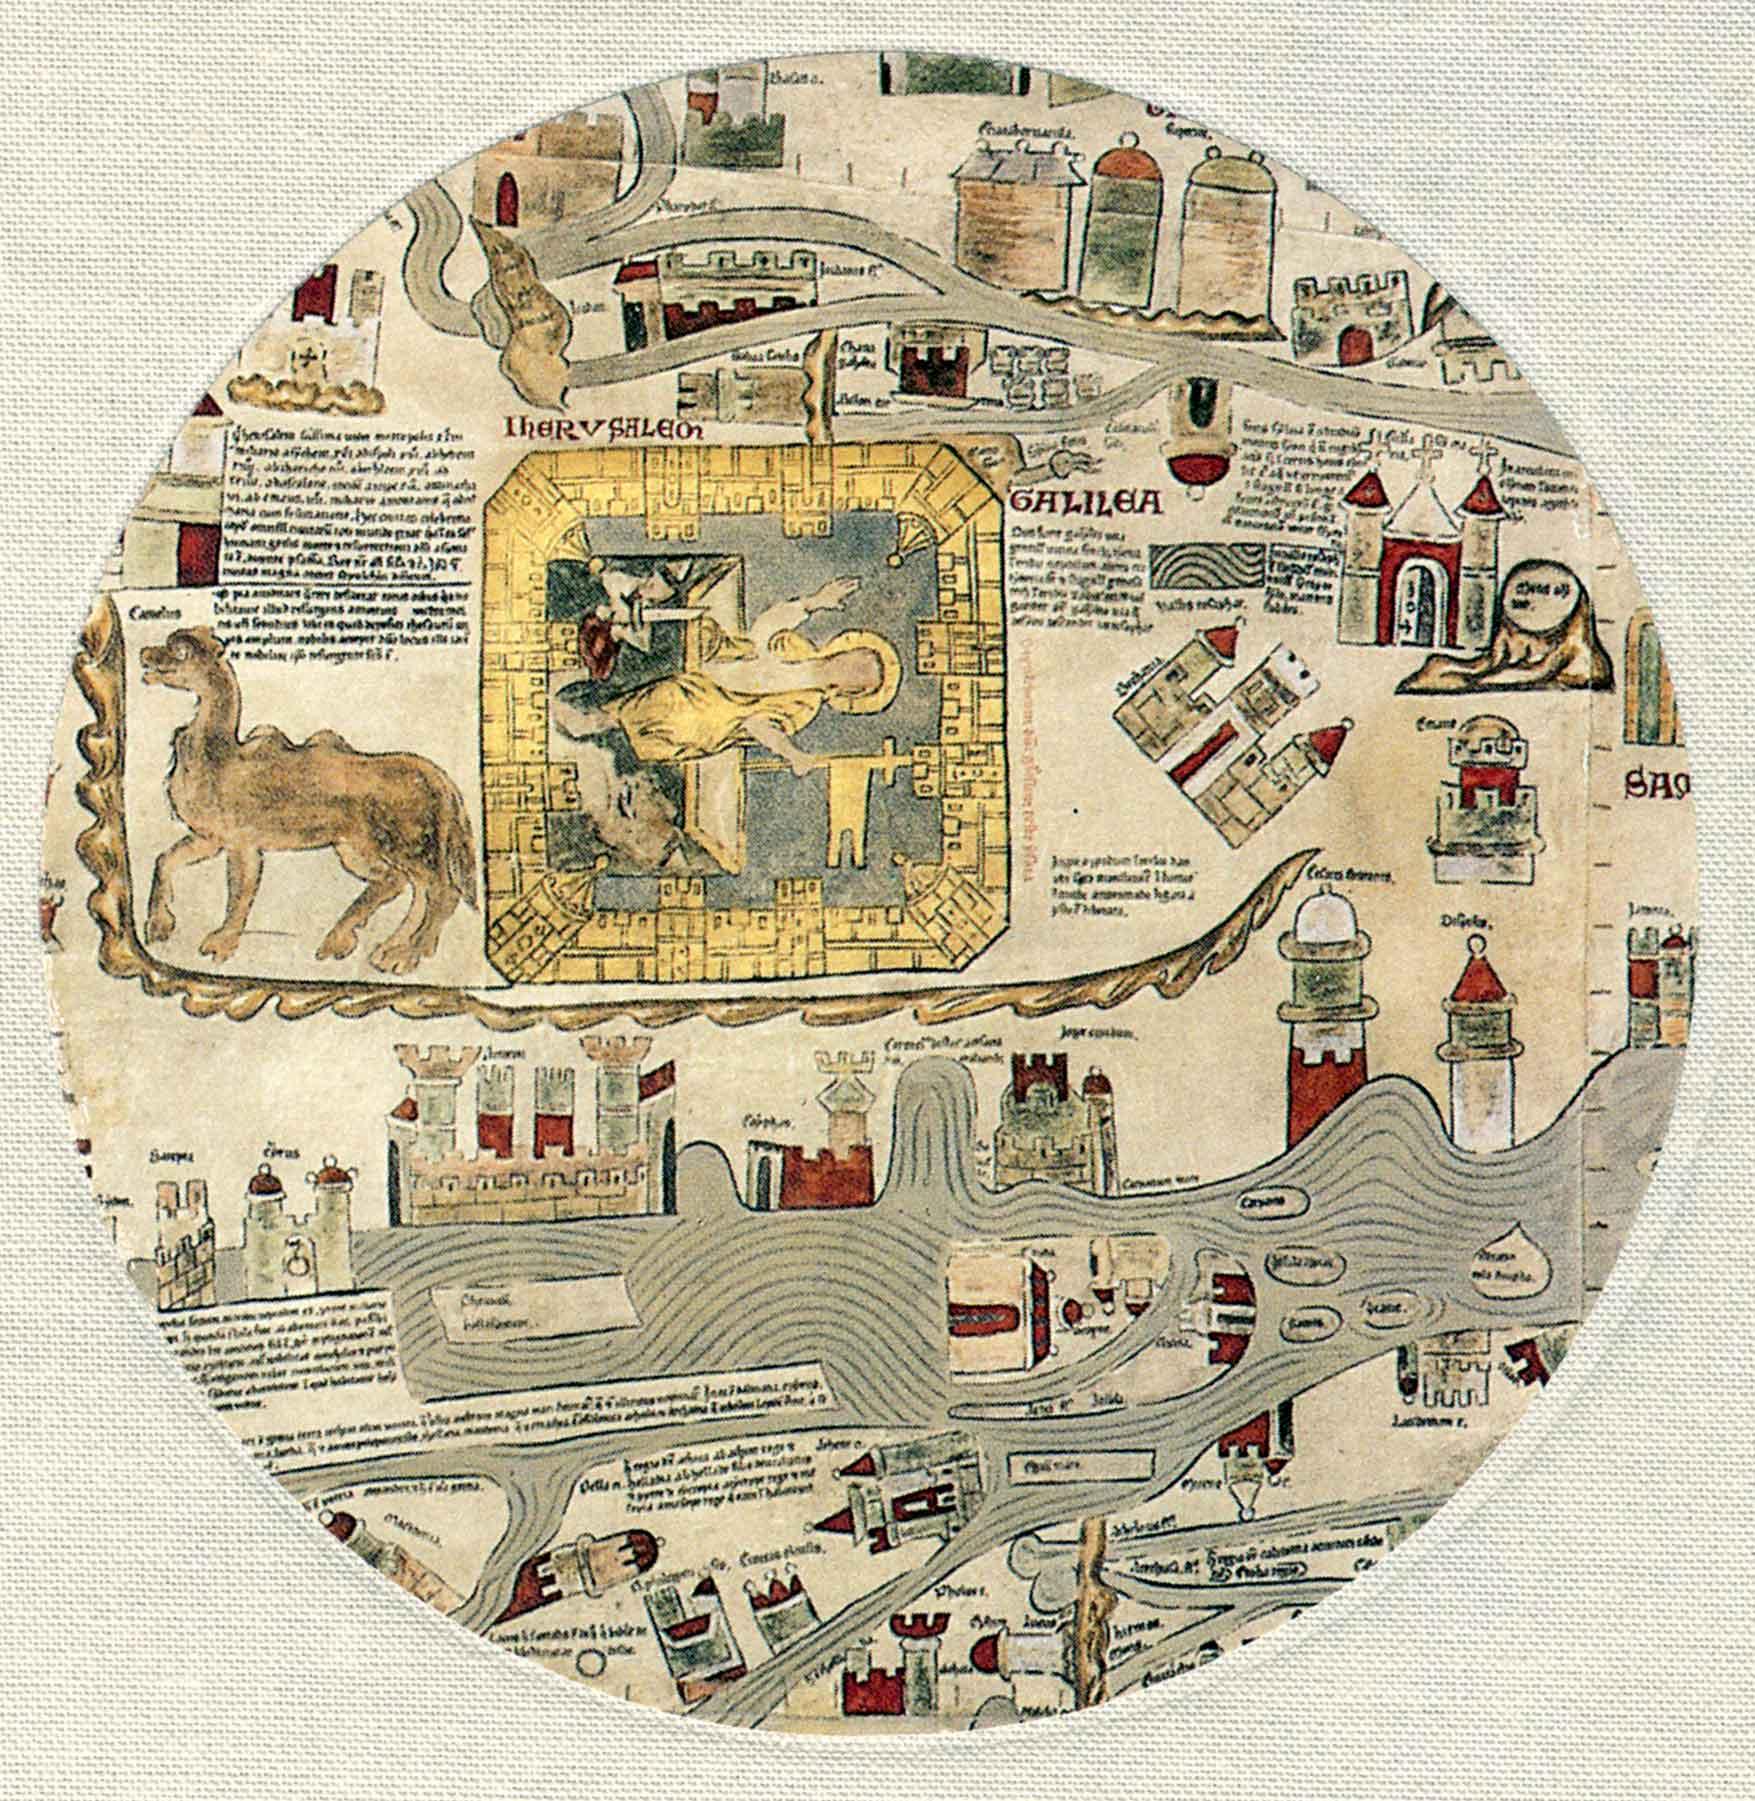 ebstorfer weltkarte beschreibung Die Ebstorfer Weltkarte